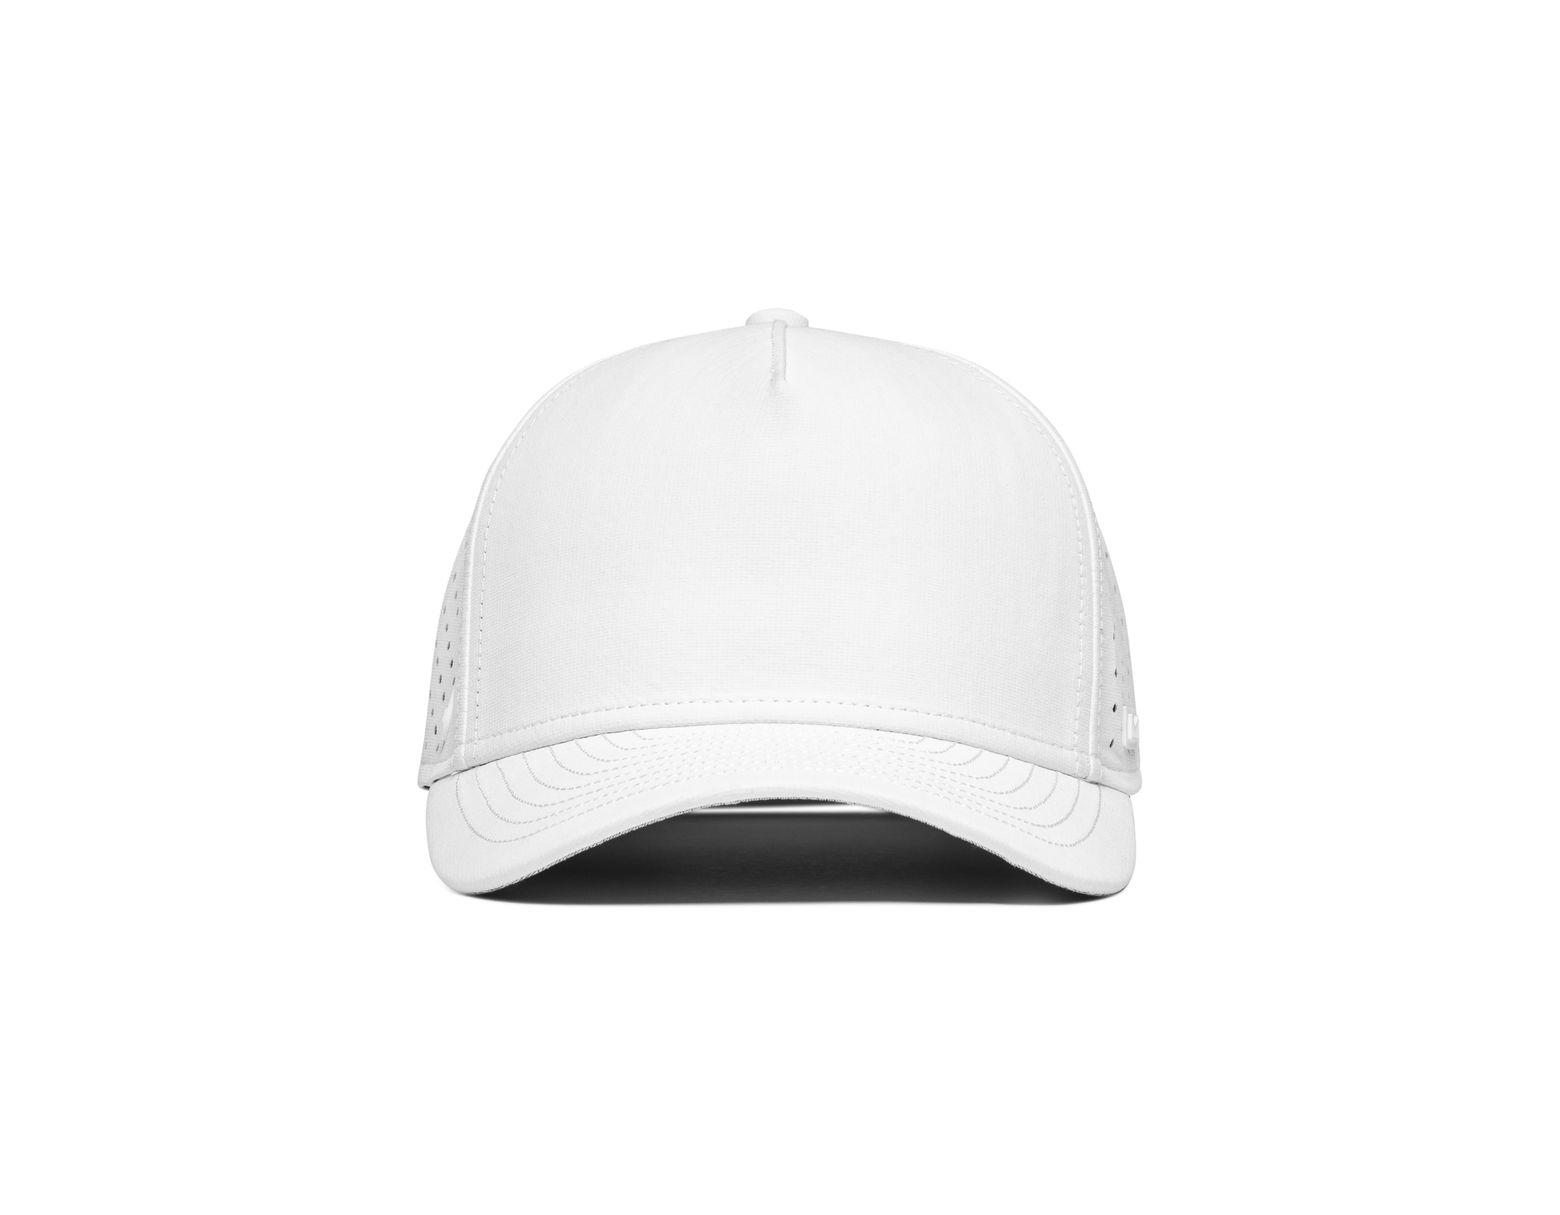 317ab2931f2 Melin Hydro Odyssey Snapback Baseball Cap in White for Men - Lyst